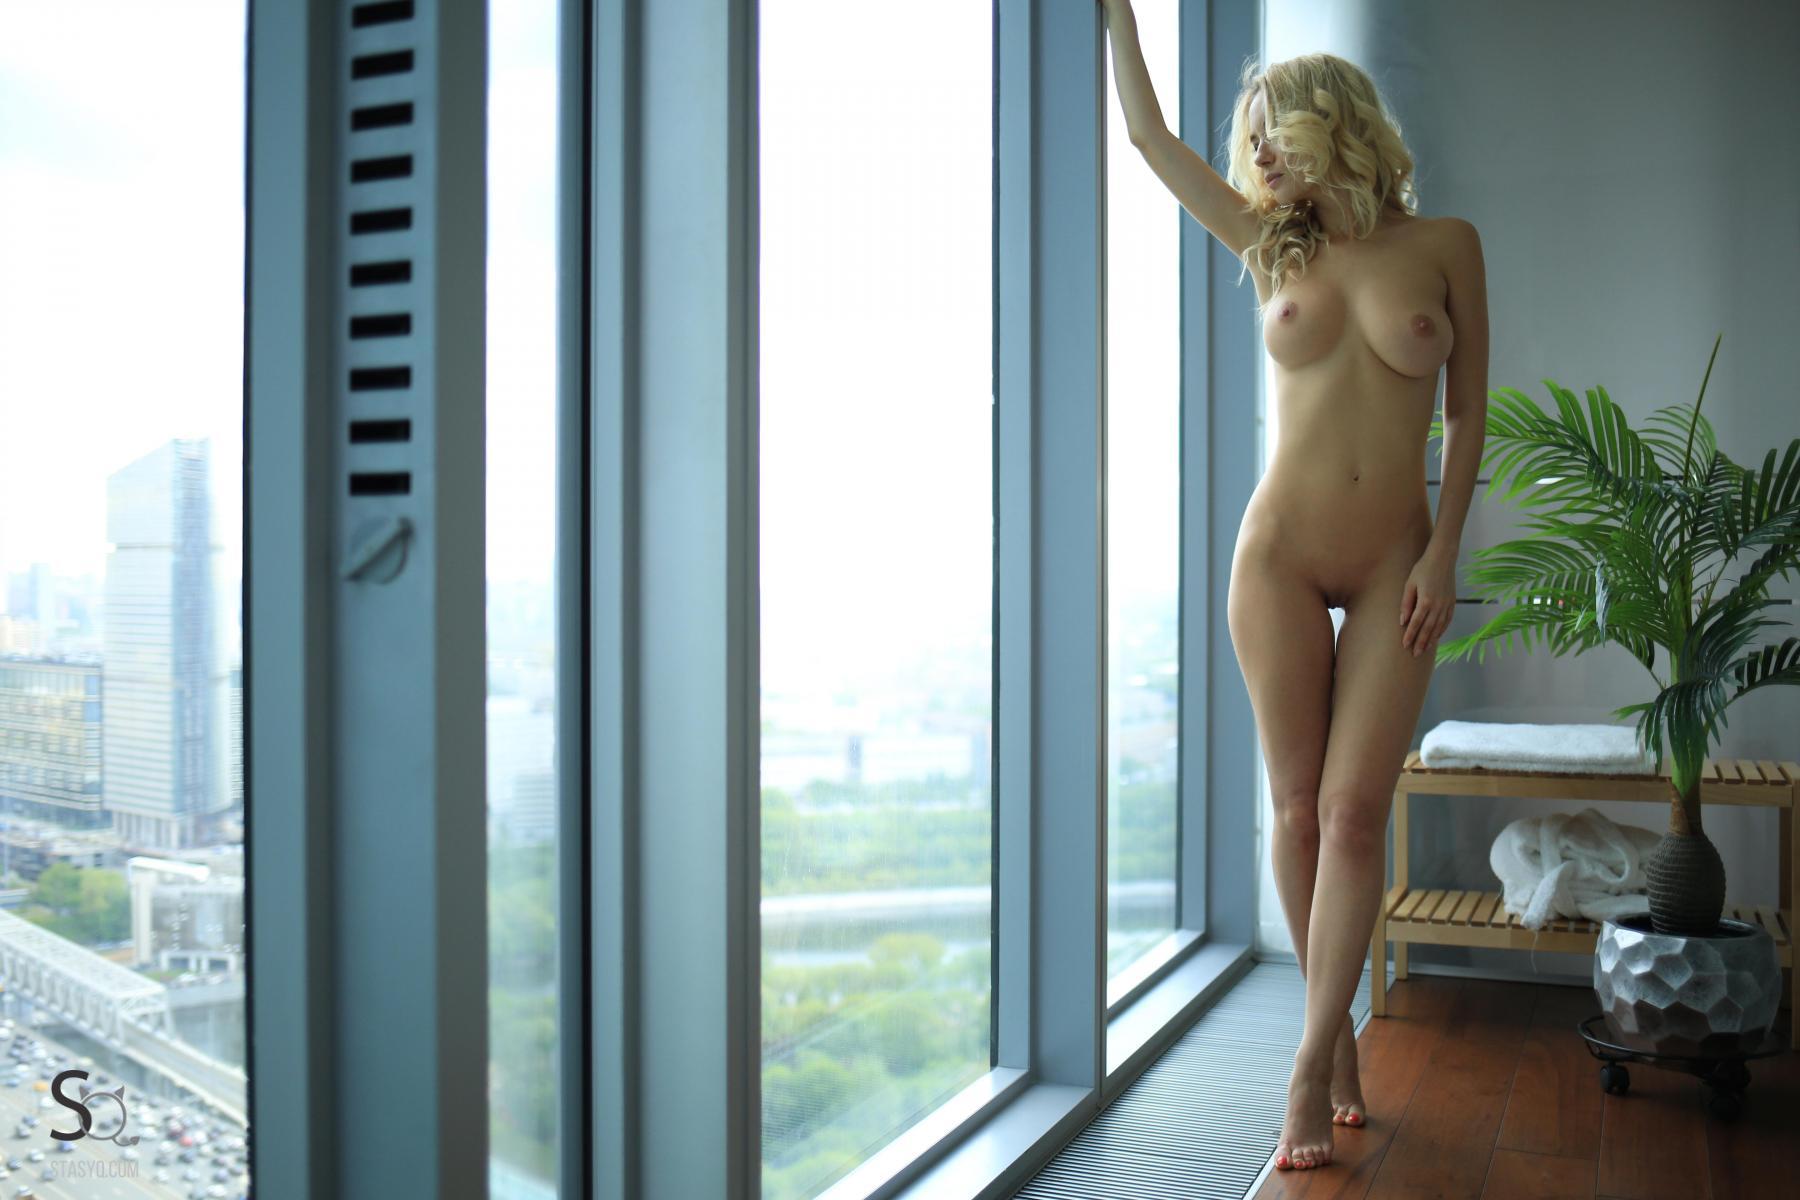 monroq-blonde-boobs-naked-bathroom-window-stasyq-36